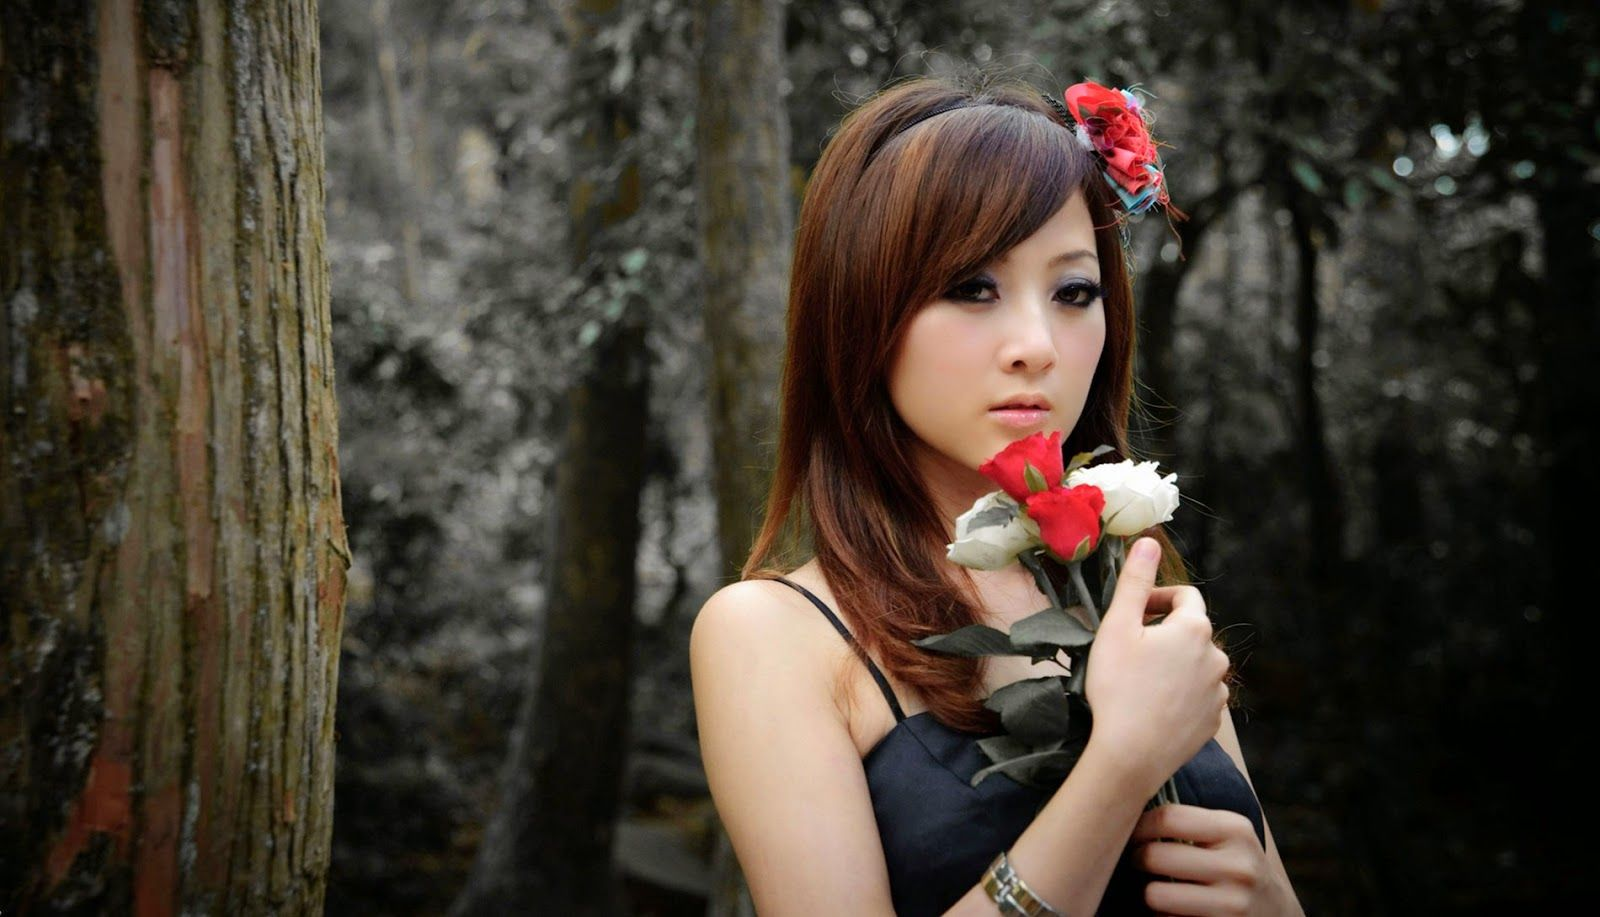 Taiwan Girl MM Gikao Beautiful Amazing Hd Wallpapers 100% High Definition  HD And High Quality